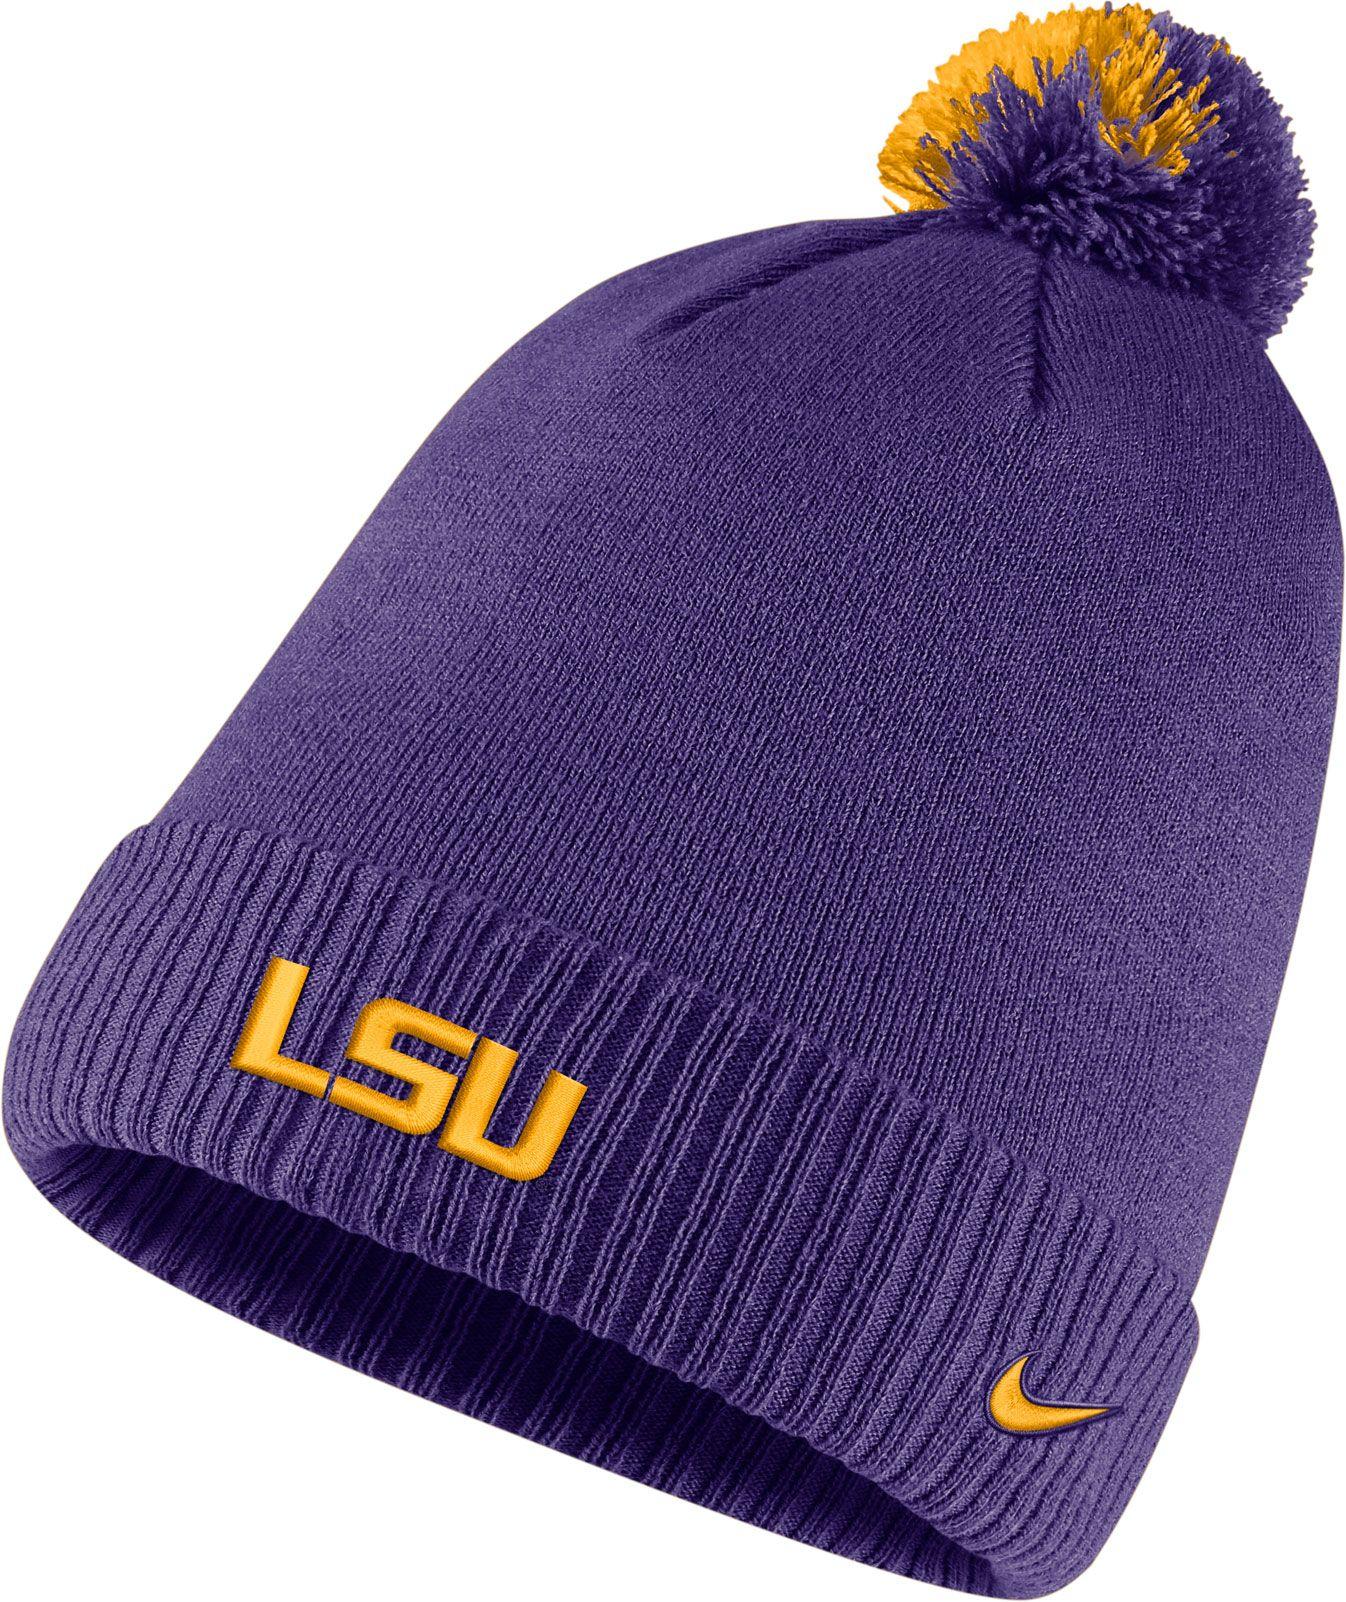 db11e10e8e5 cheapest nike mens lsu tigers purple football sideline pom beanie 7a080  8ab7b